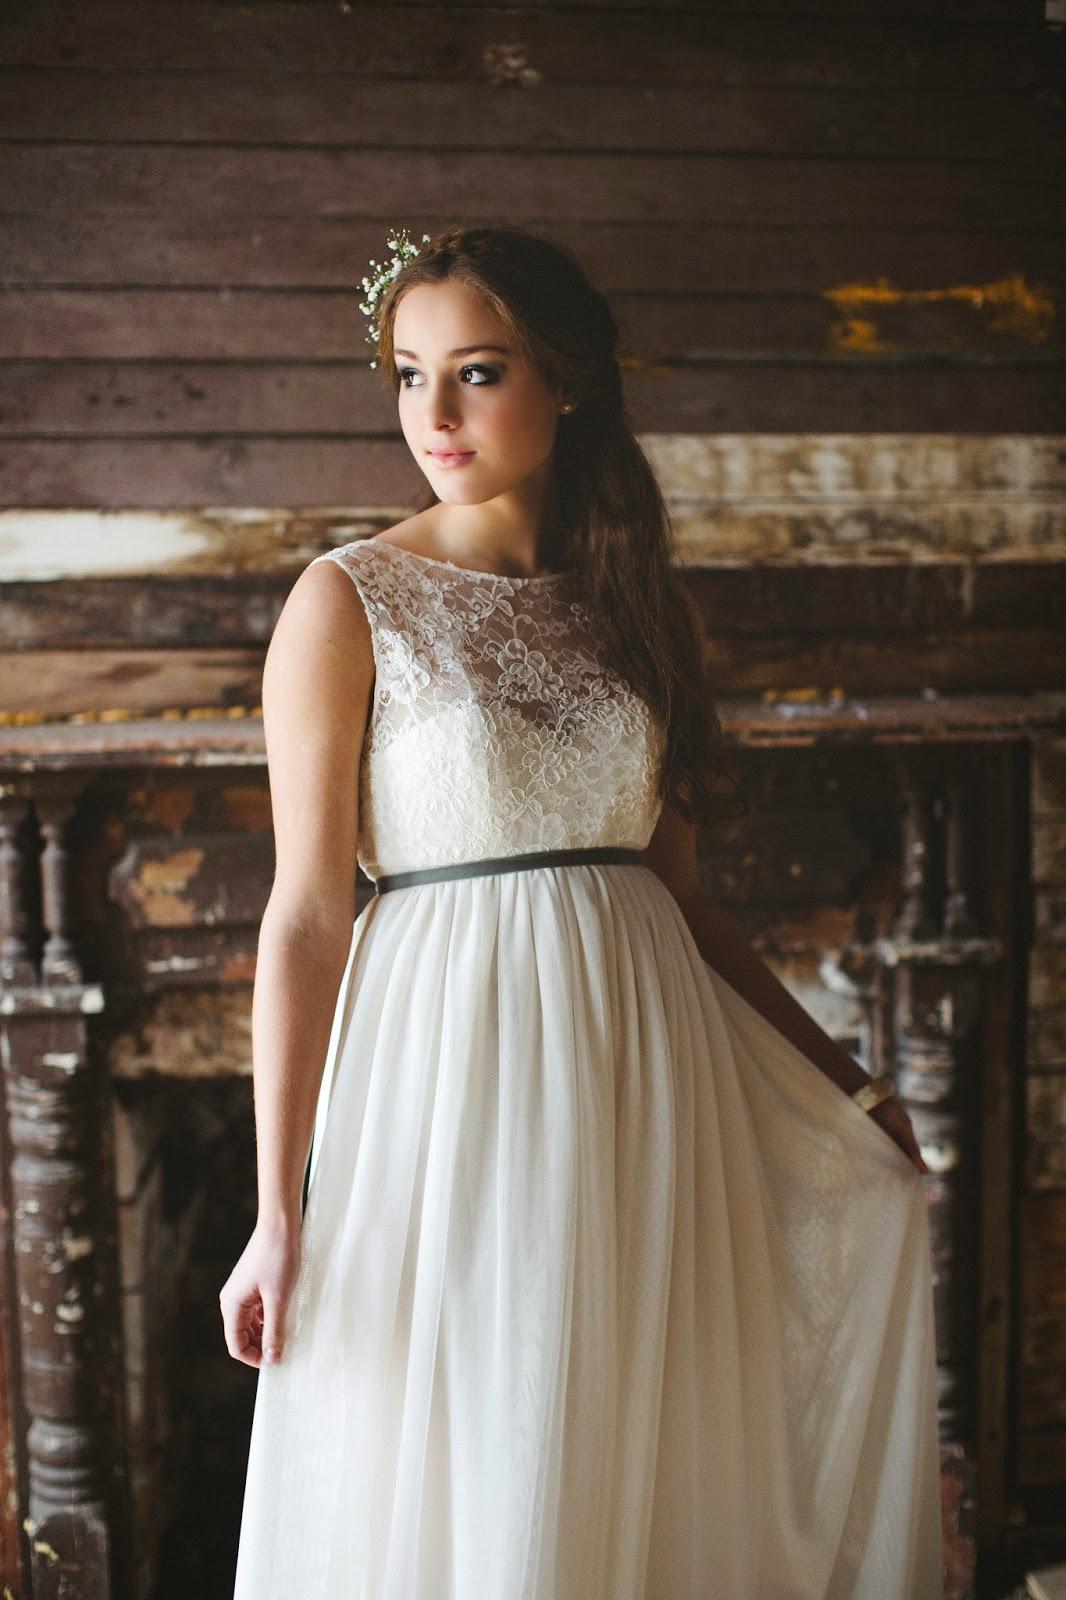 Baby doll lace wedding dress – Preloved bridal dresses